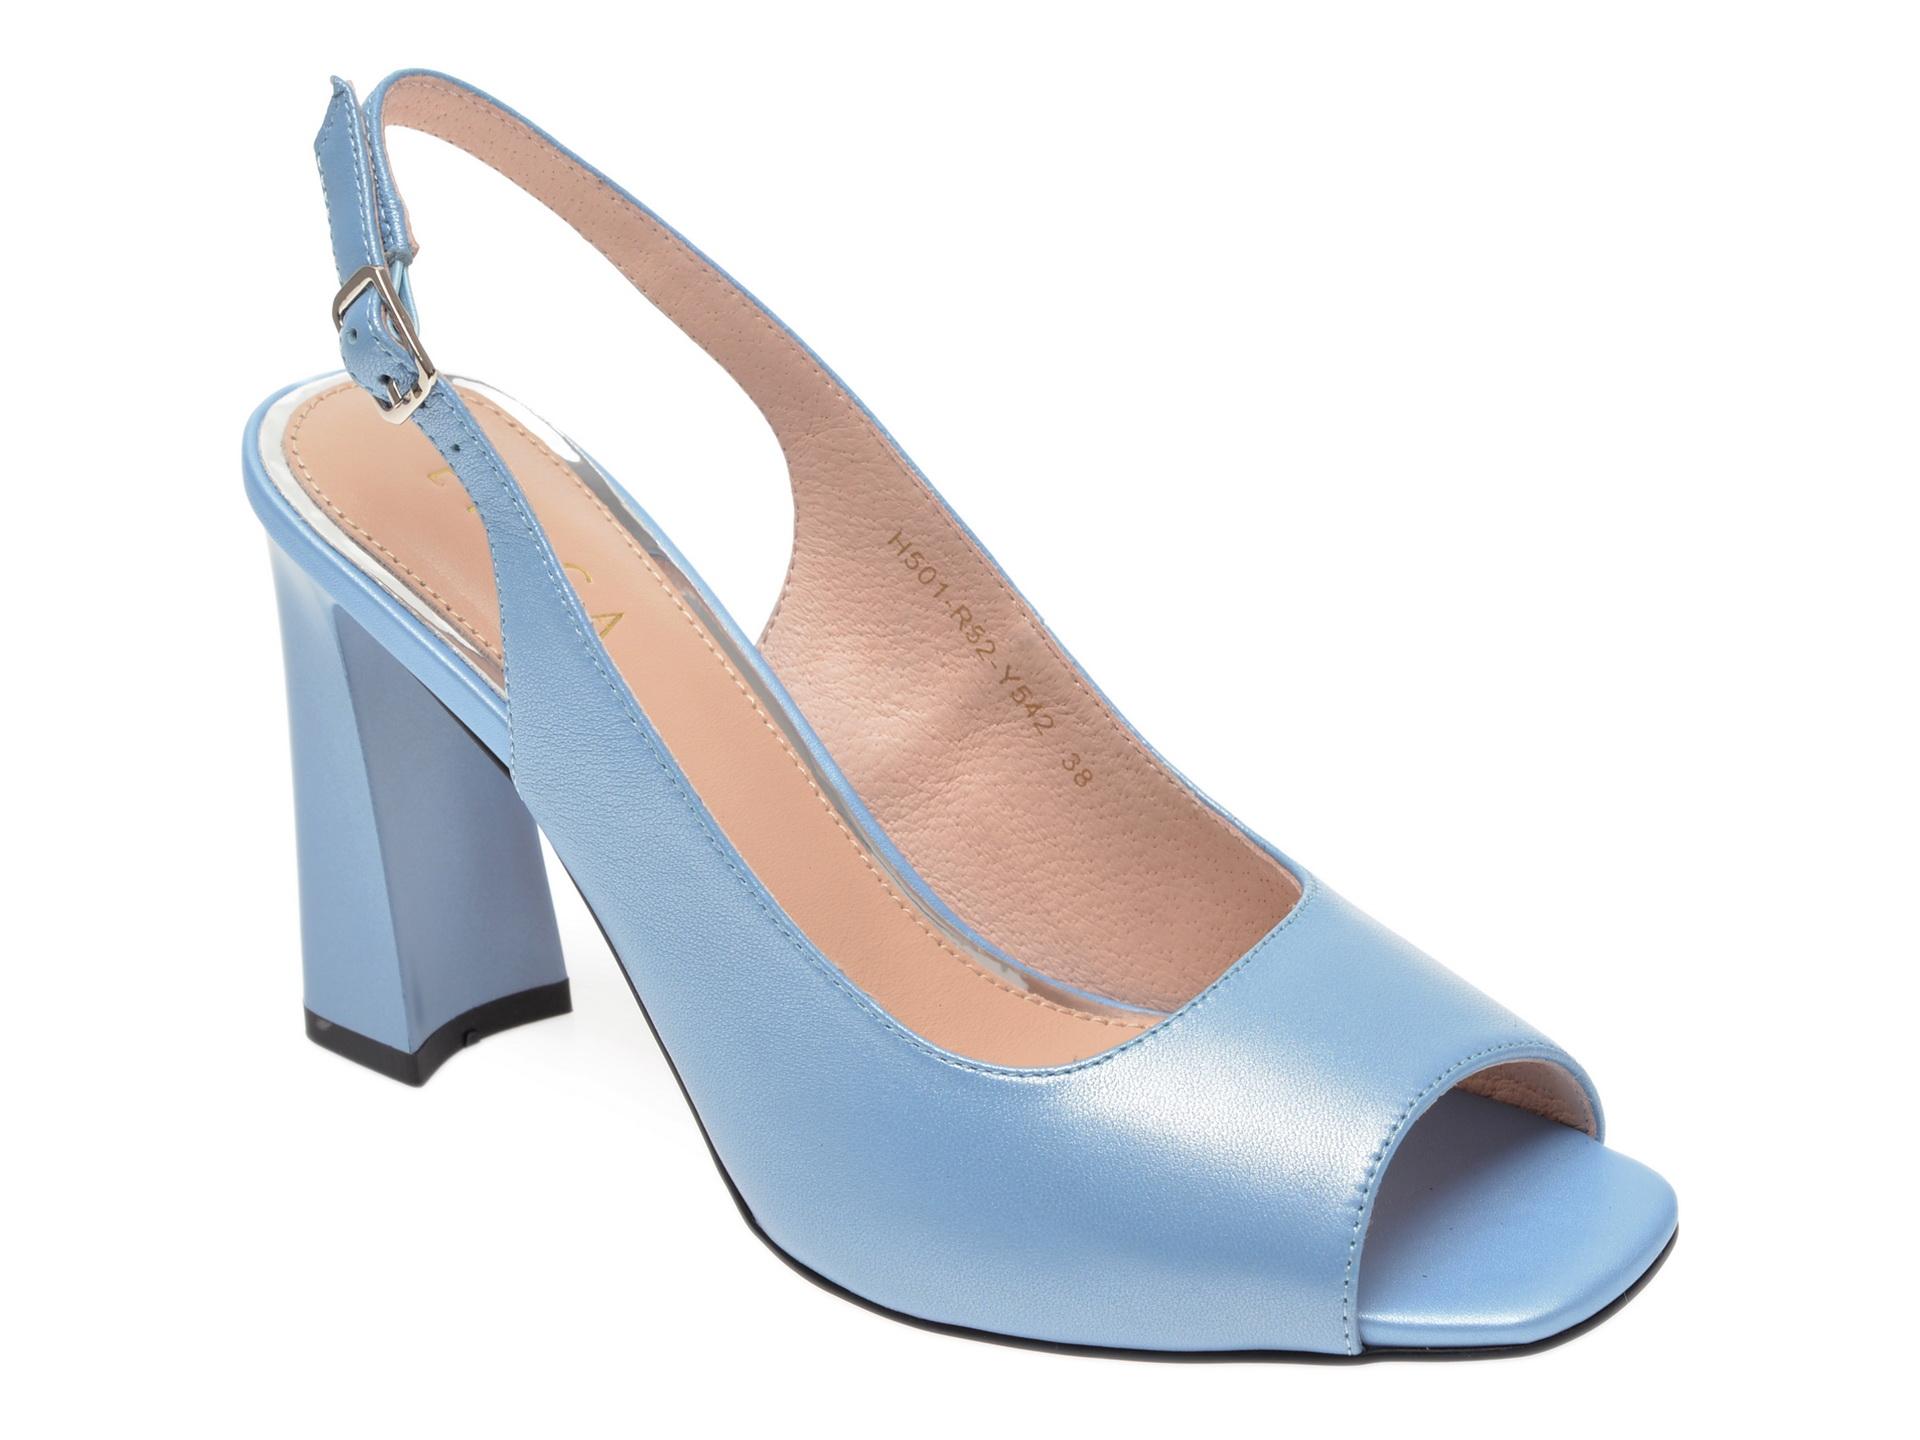 Sandale EPICA albastre, H501R52, din piele naturala